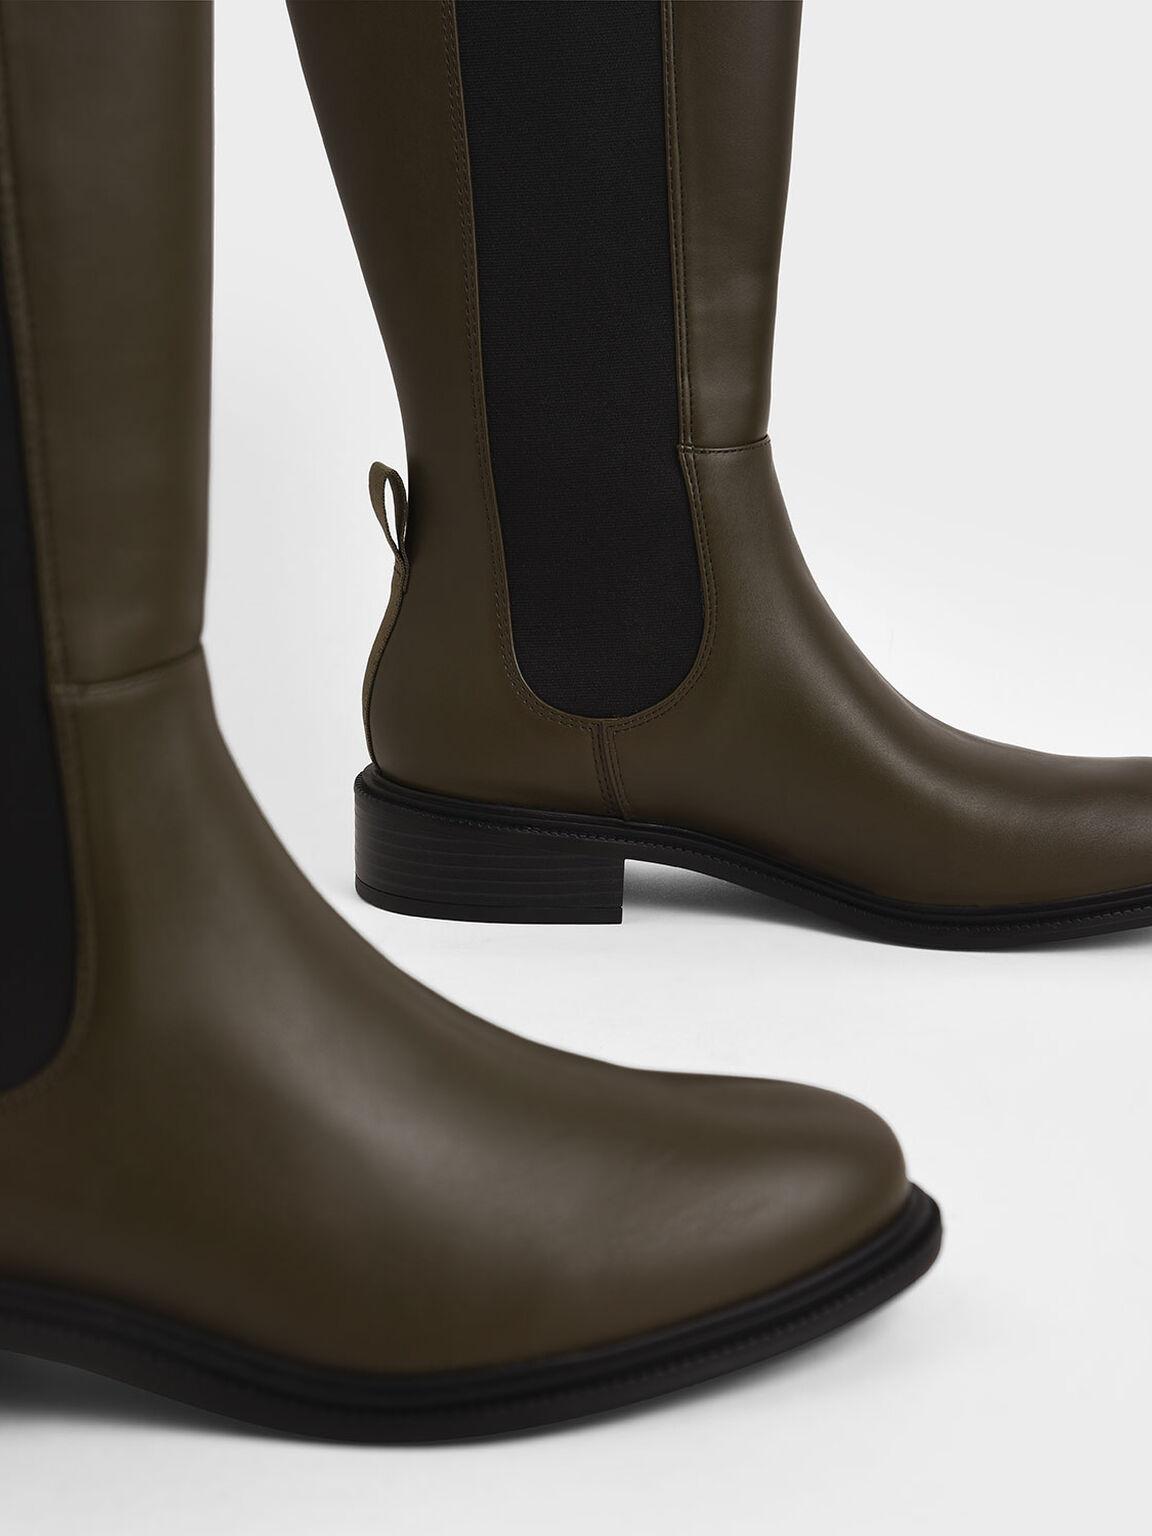 Knee High Chelsea Boots, Olive, hi-res